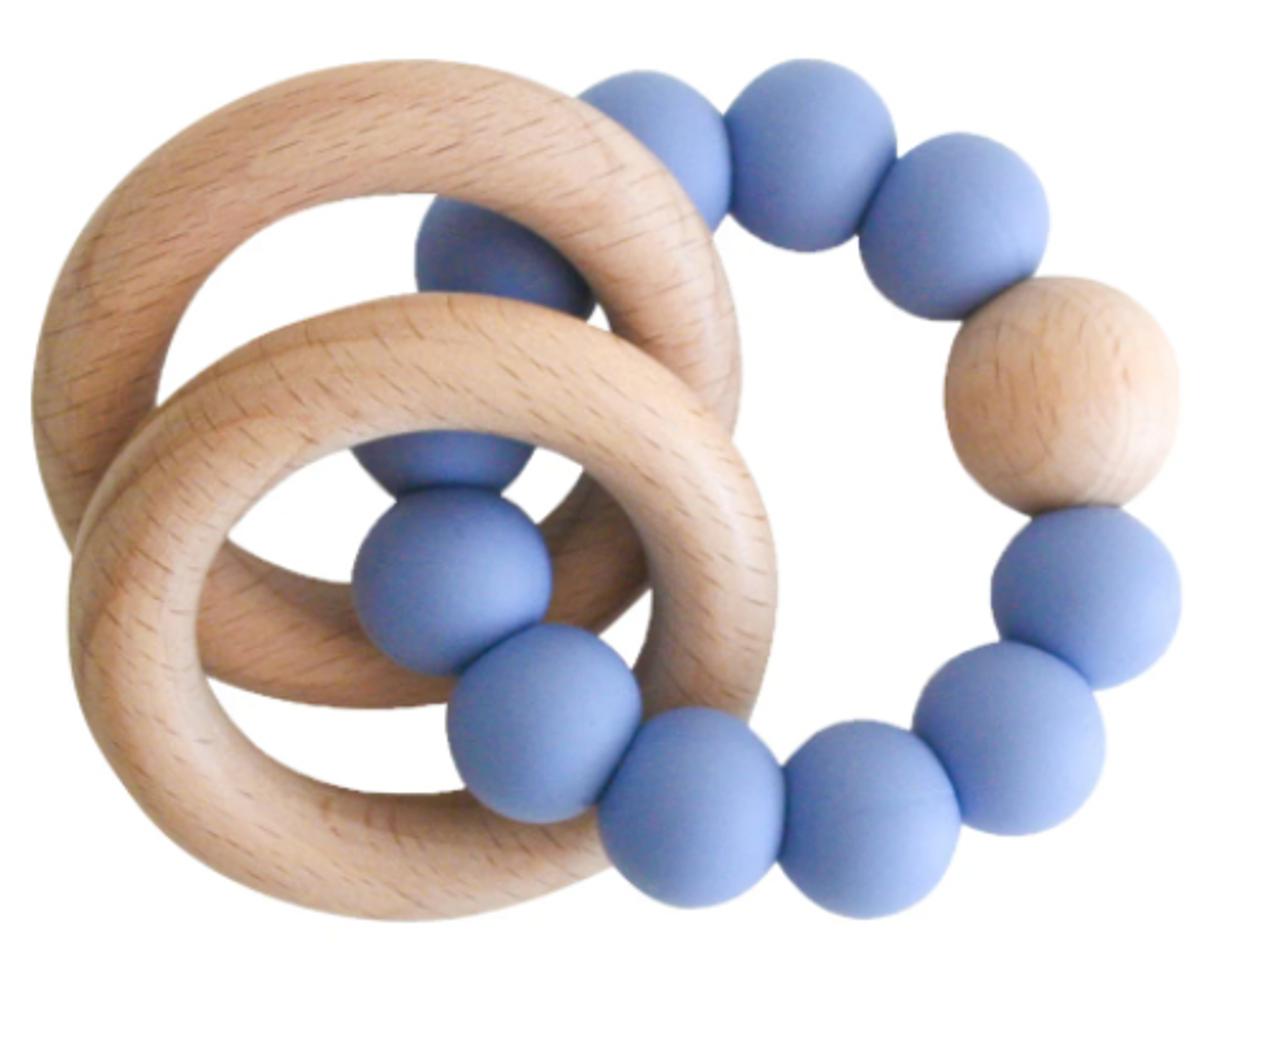 Beechwood Teether Ring Set - Blue